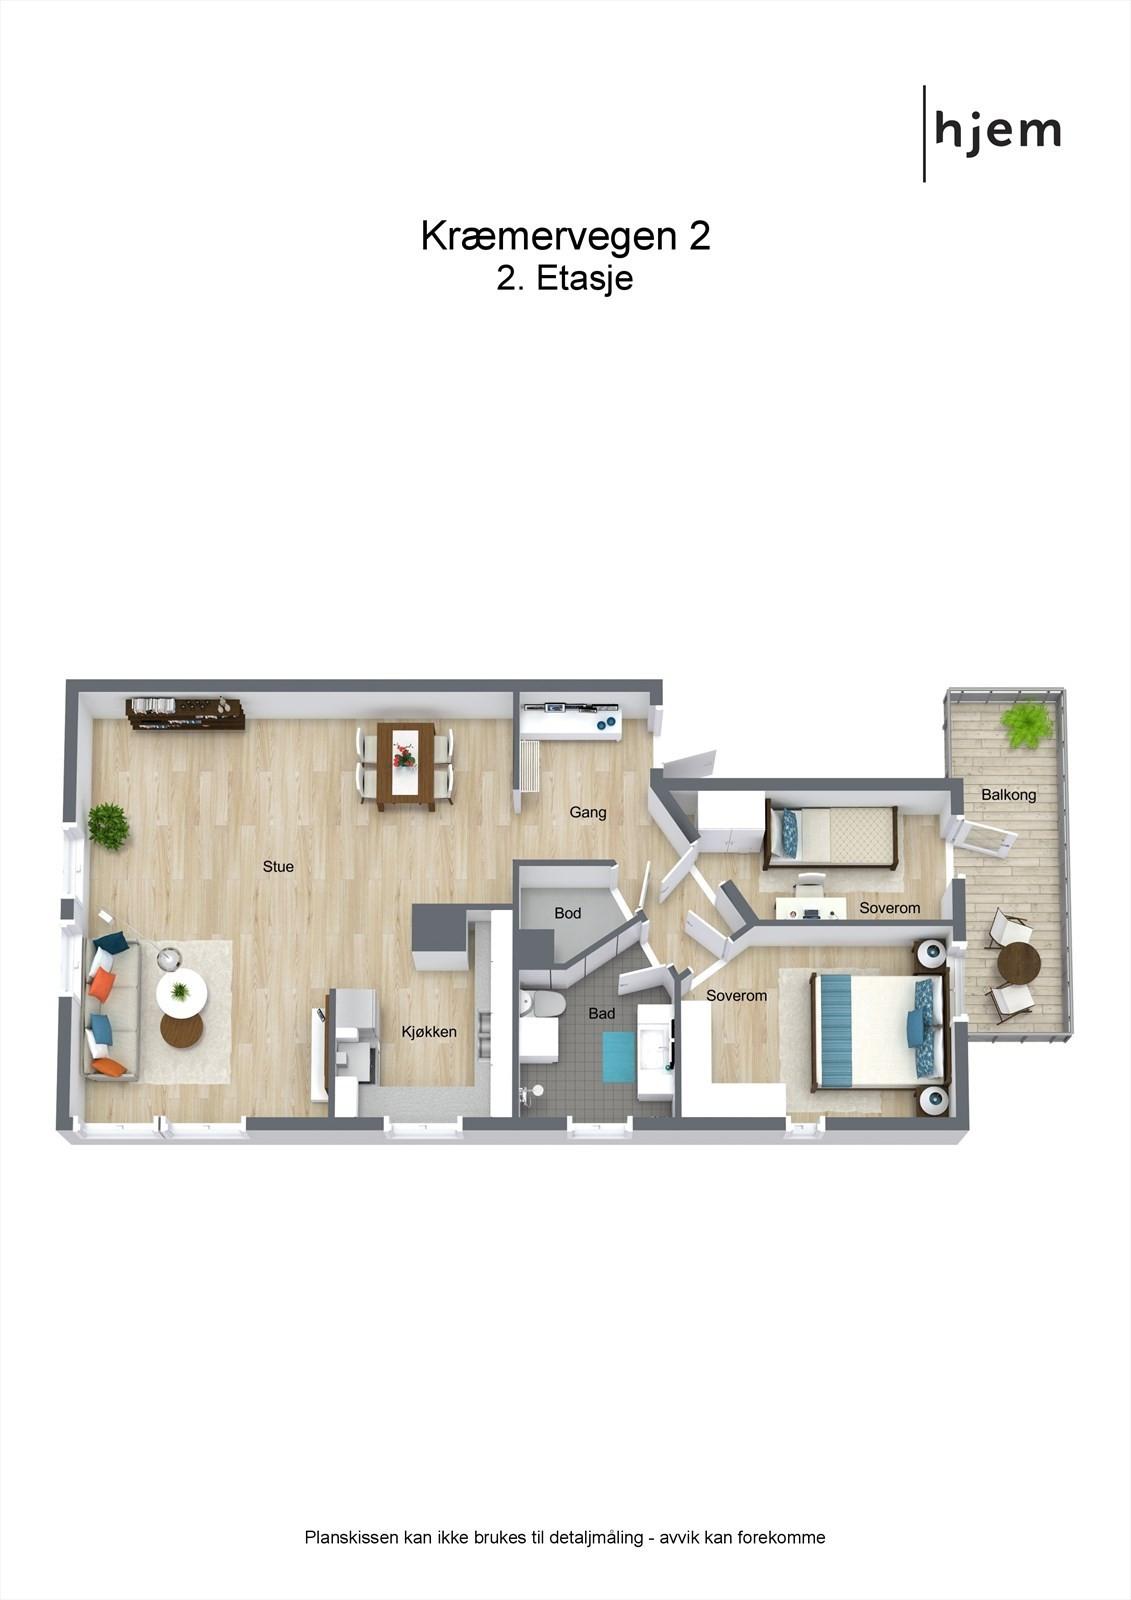 Floorplan letterhead - Kræmervegen 2 - 2. Etasje - 3D Floor Plan.jpg